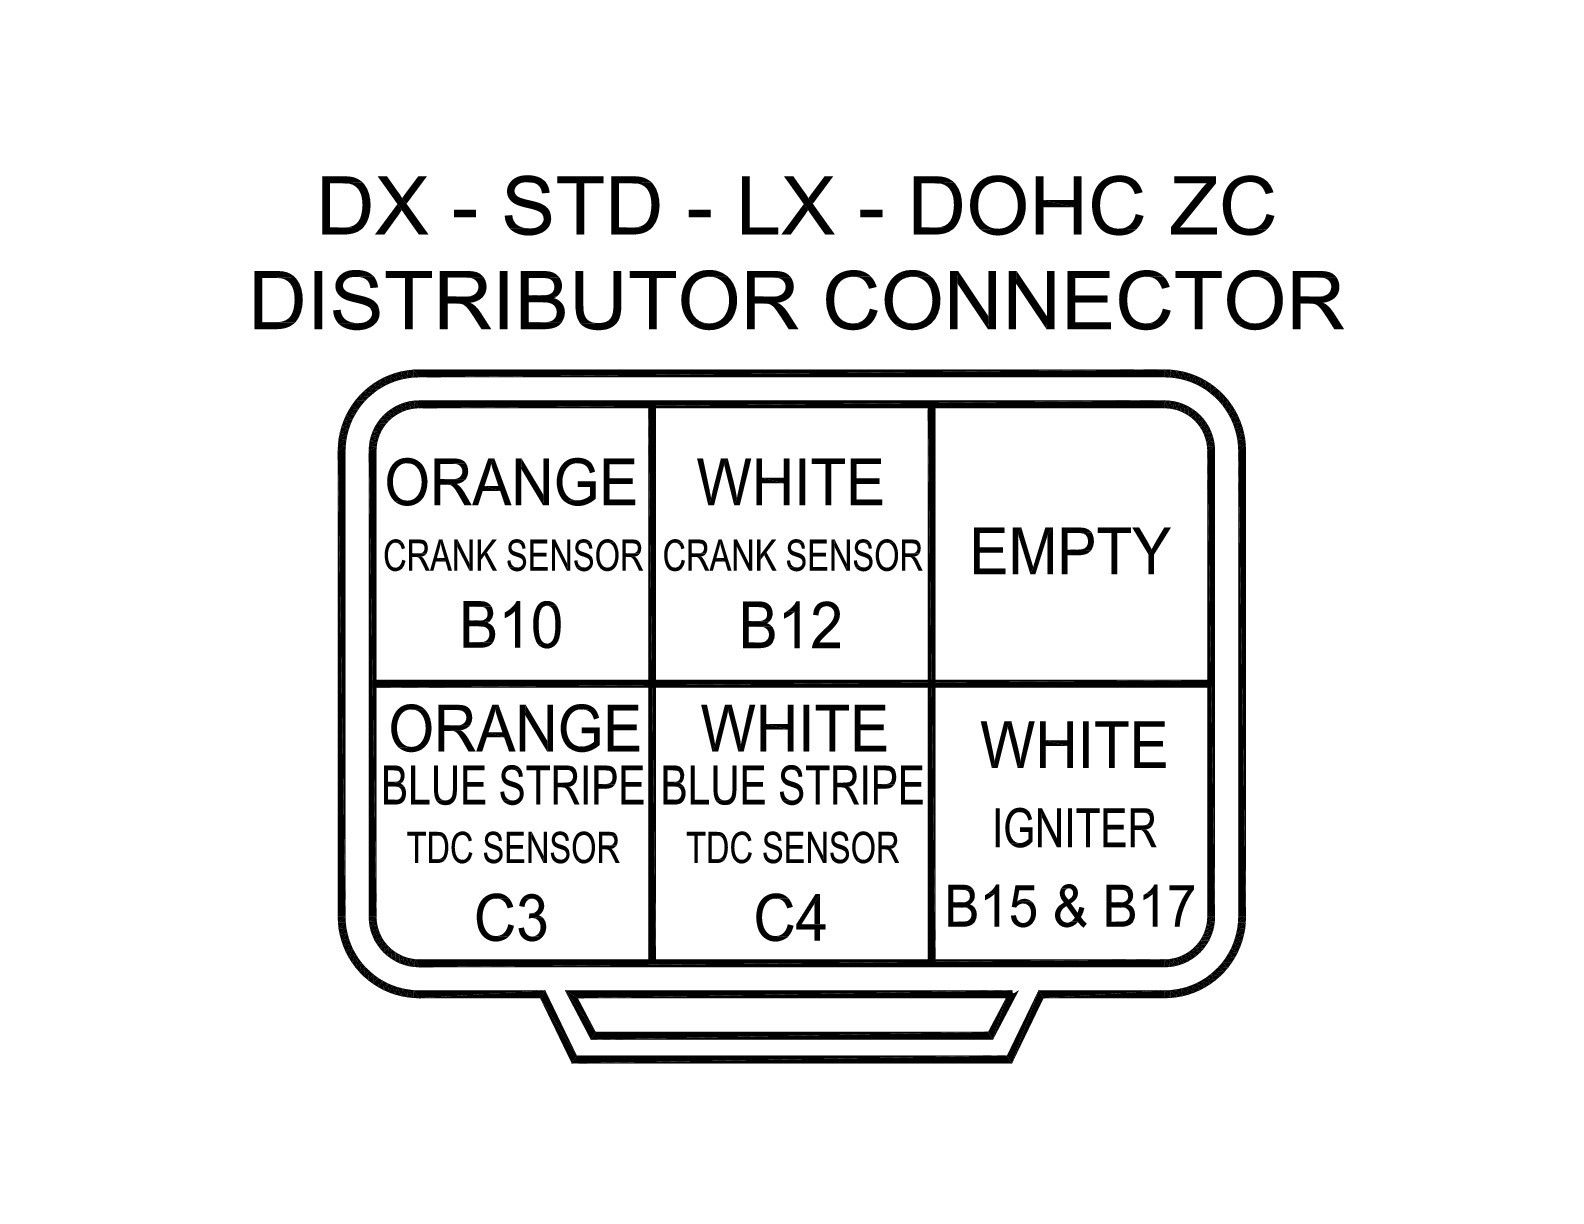 DXCONN.jpg